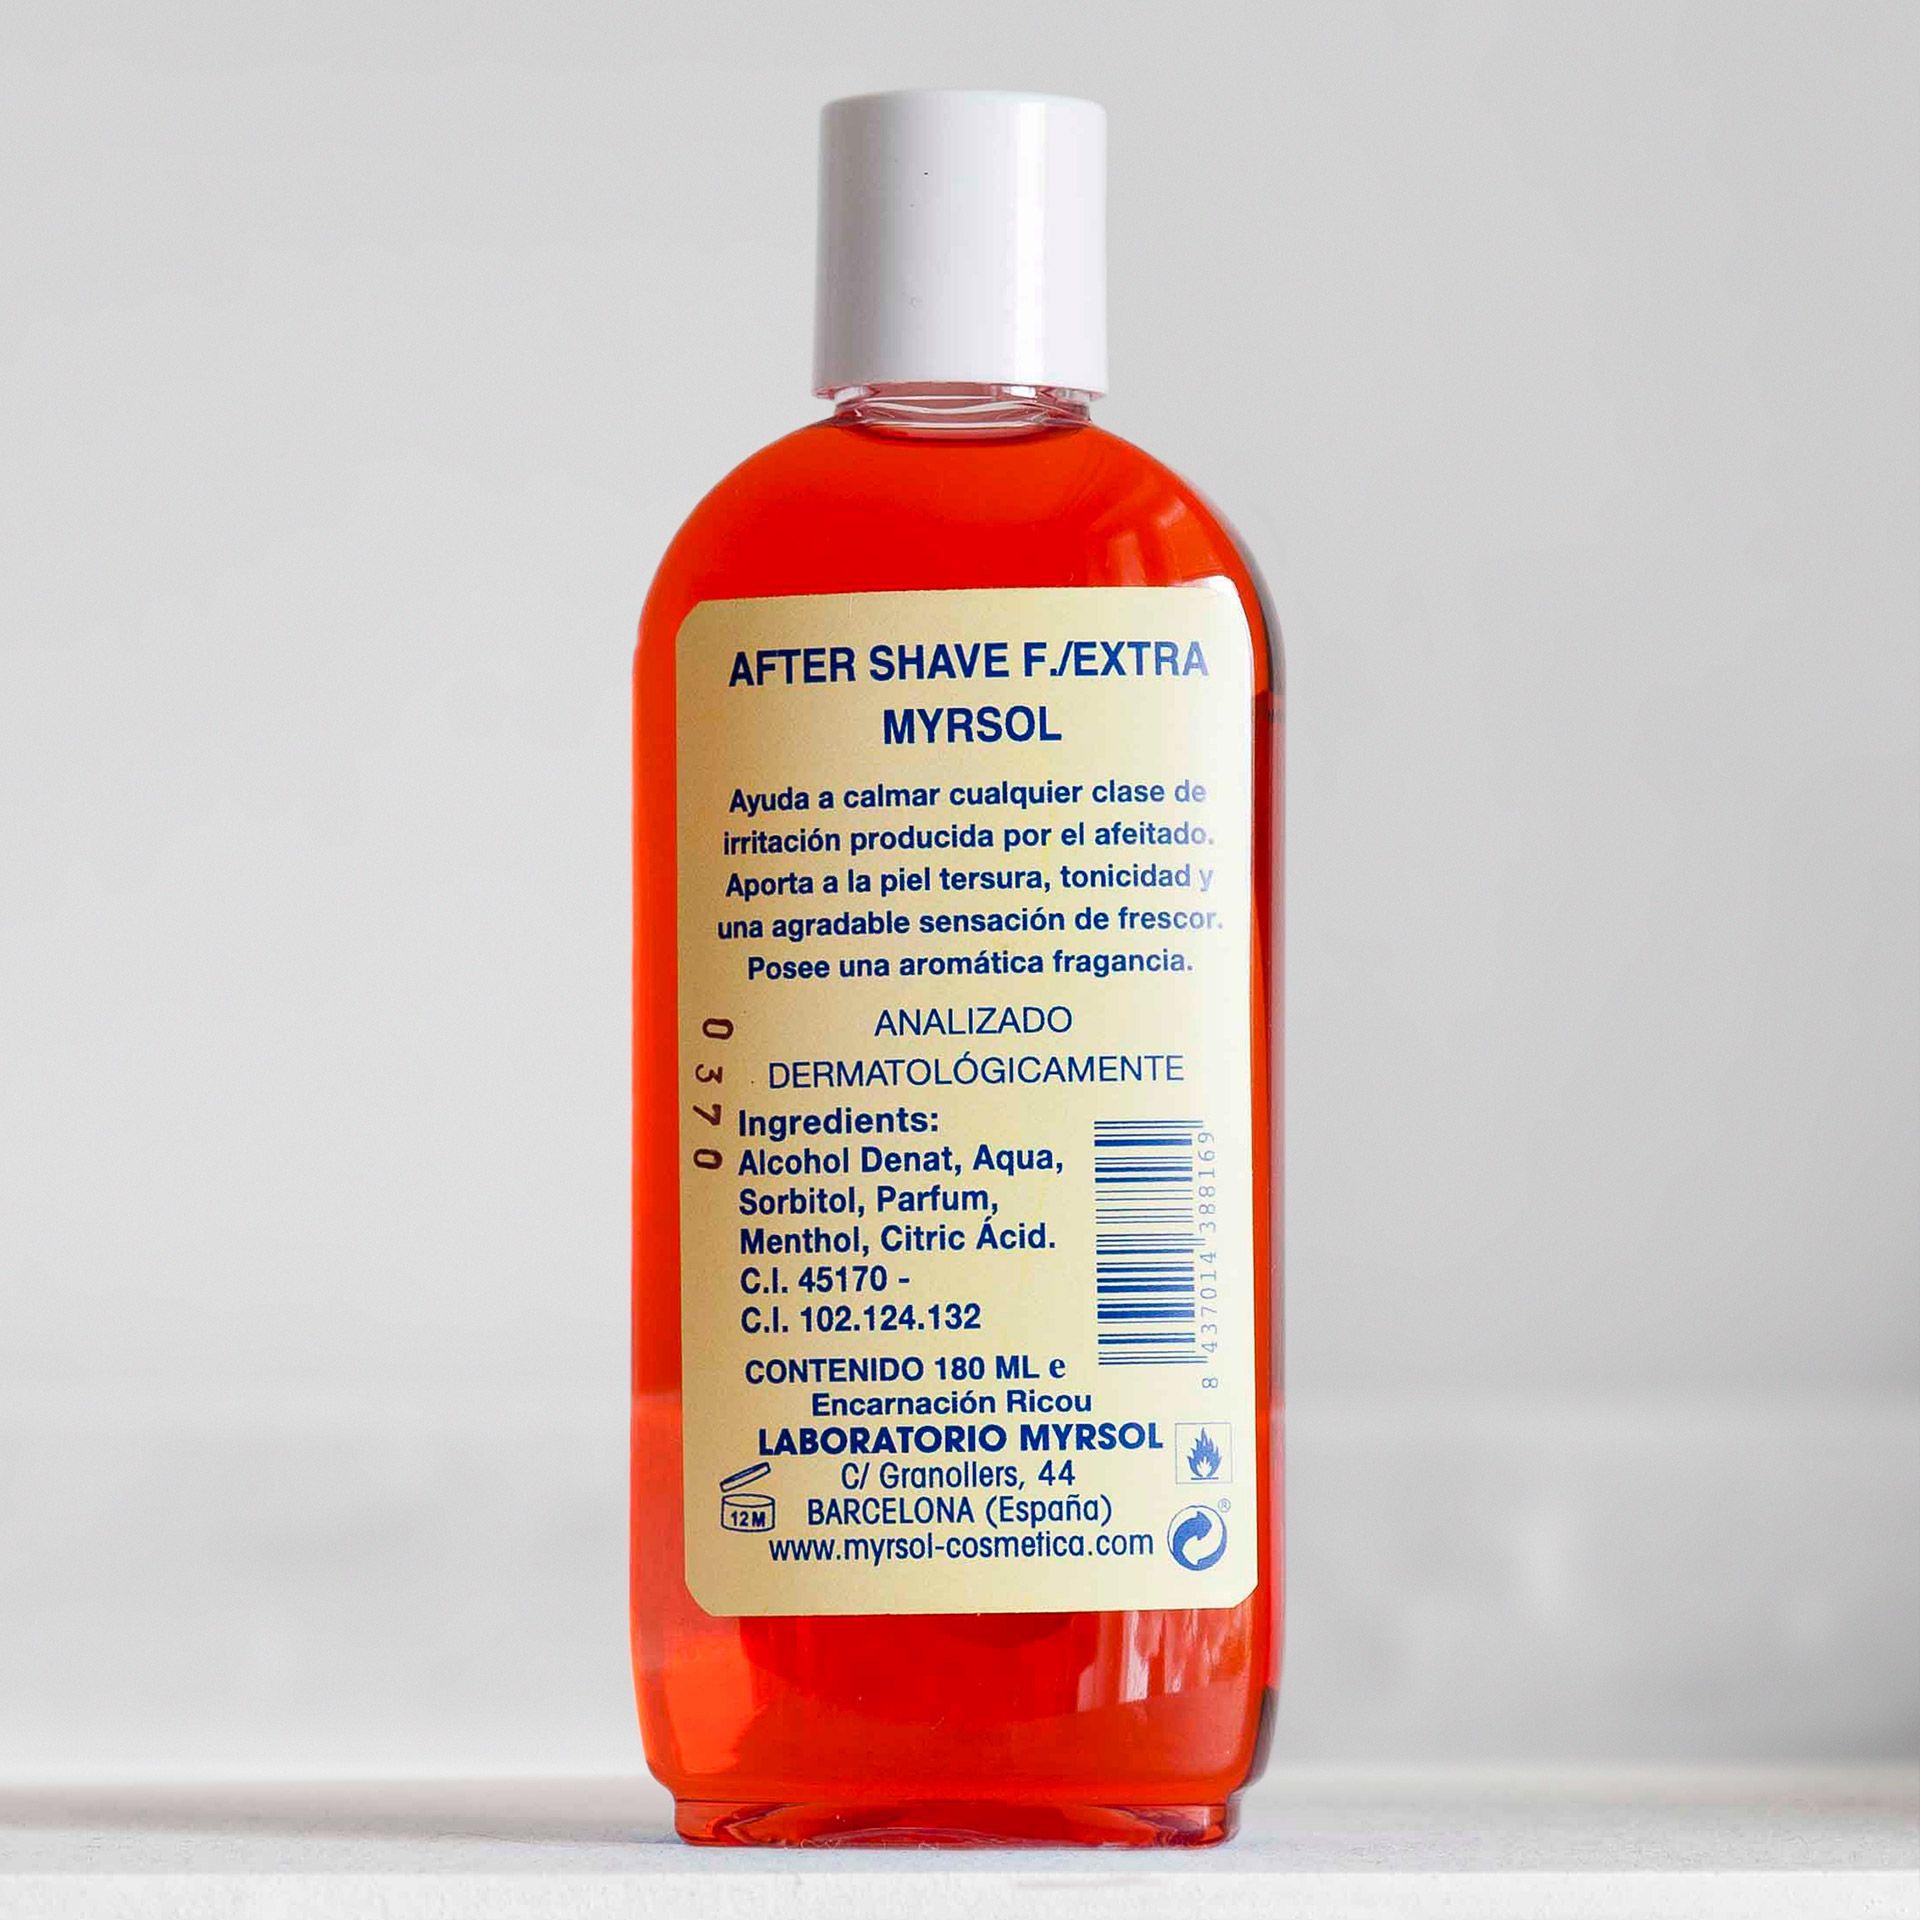 Skład wody po goleniu Myrsol F. Extra After Shave (INCI ingredients)